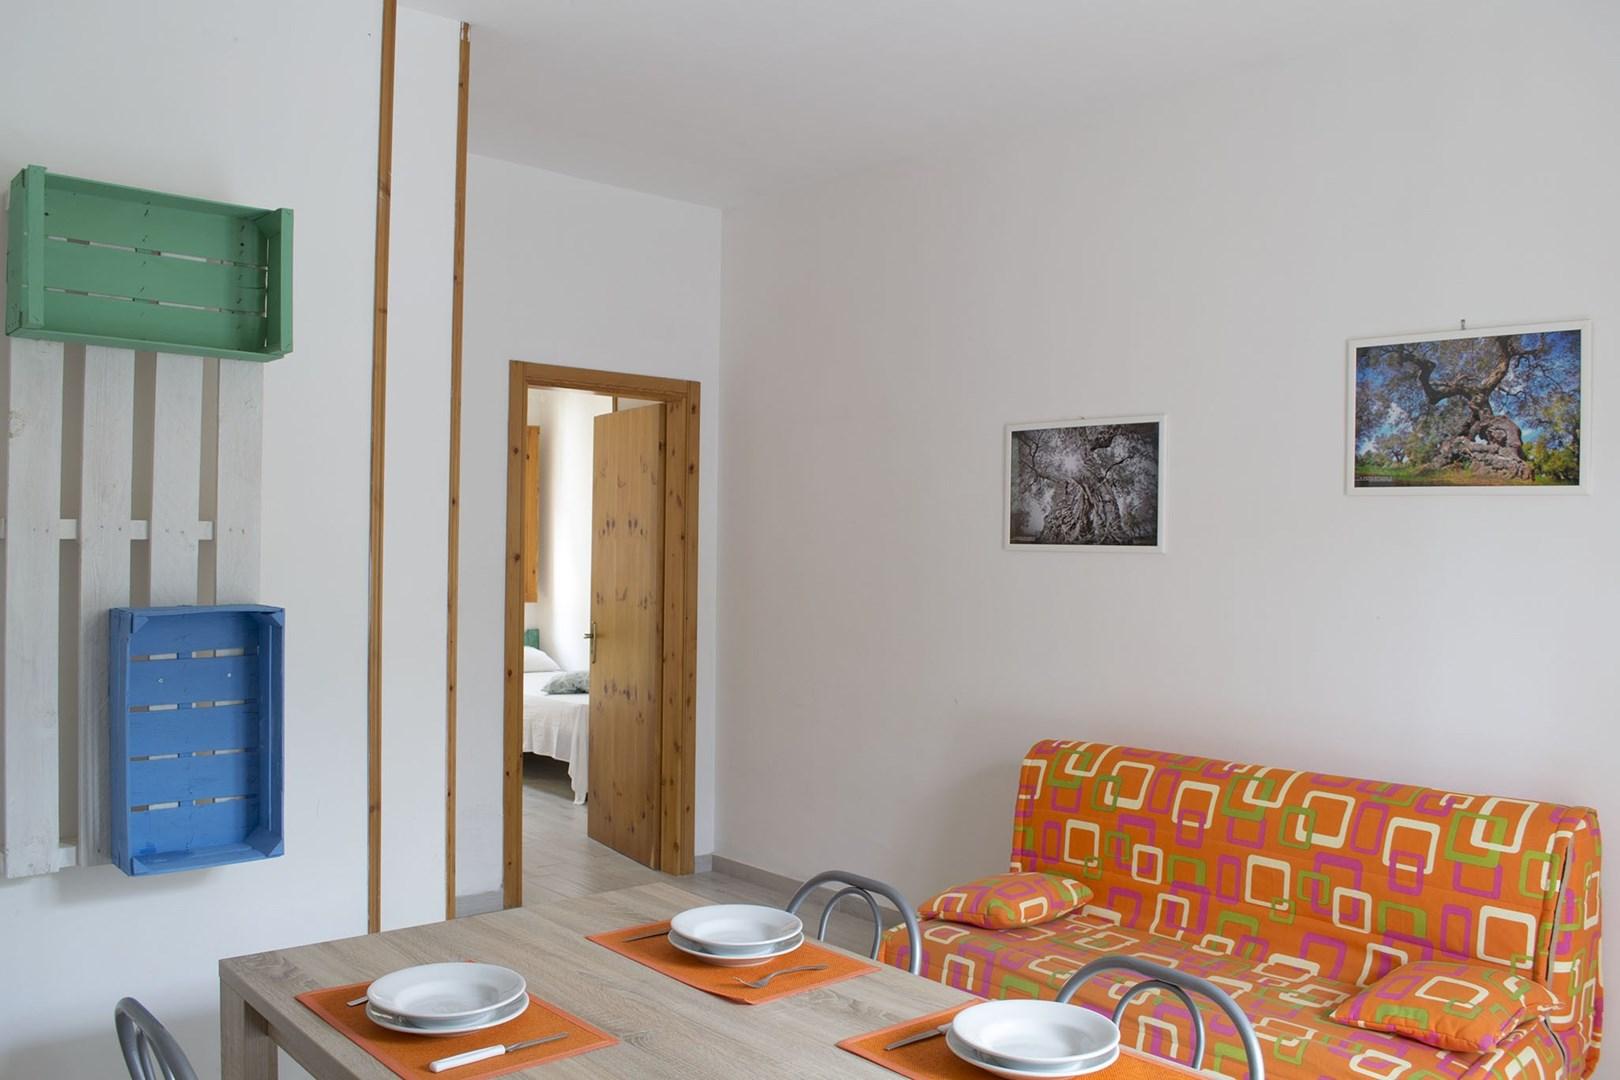 6_residence-borgo-latino_residence_borgo_latino_soggiorno_trilo_2.jpg